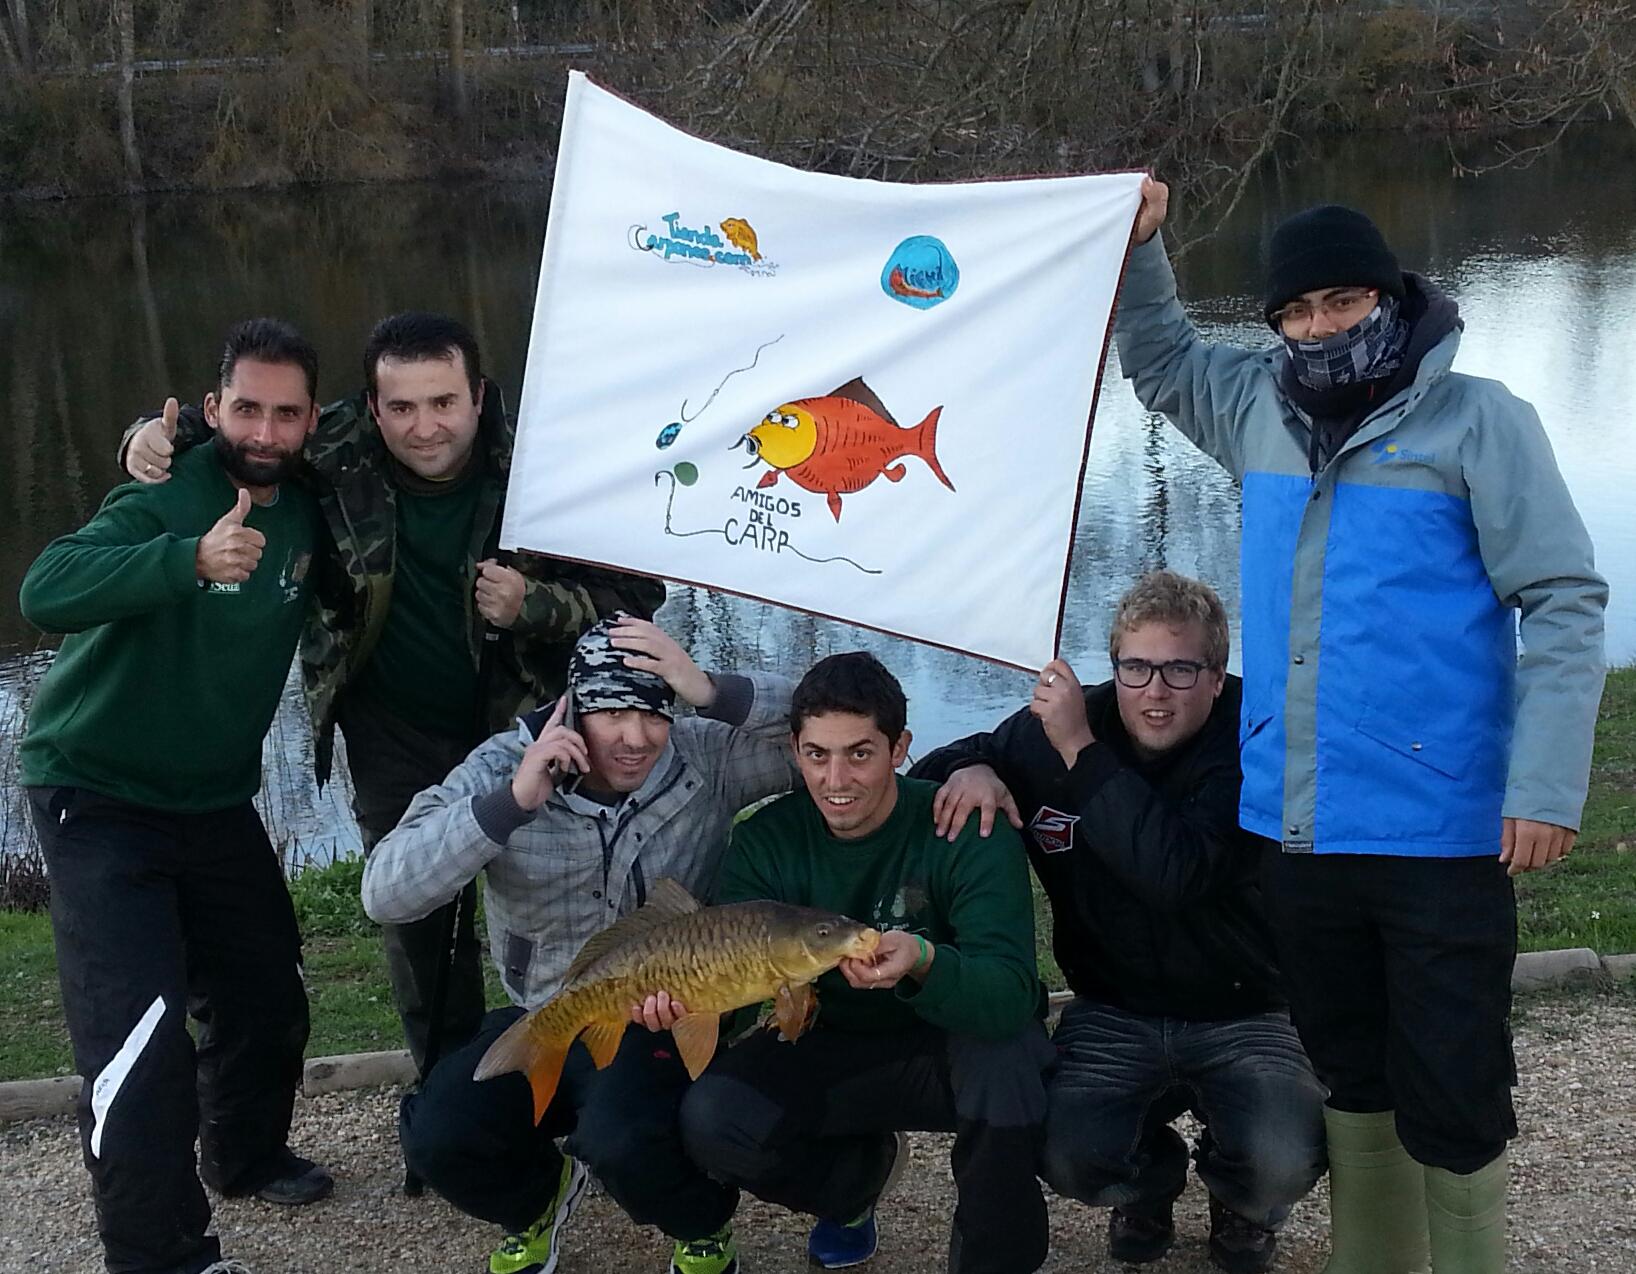 La pesca al carpfishing: sinónimo de amistad